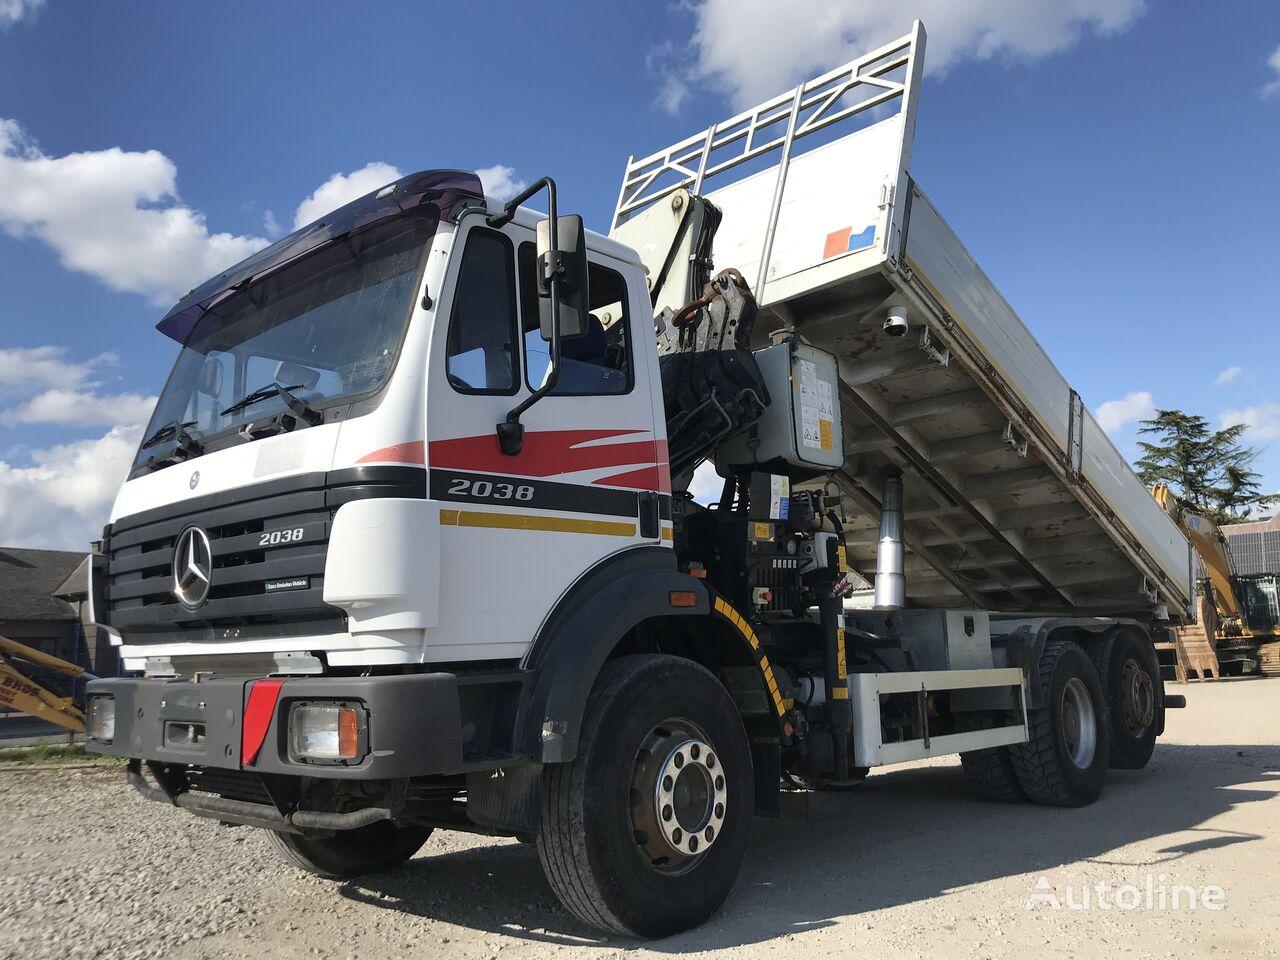 MERCEDES-BENZ SK 2038 - 6x2 //WITH CRANE 7700 KG// dump truck